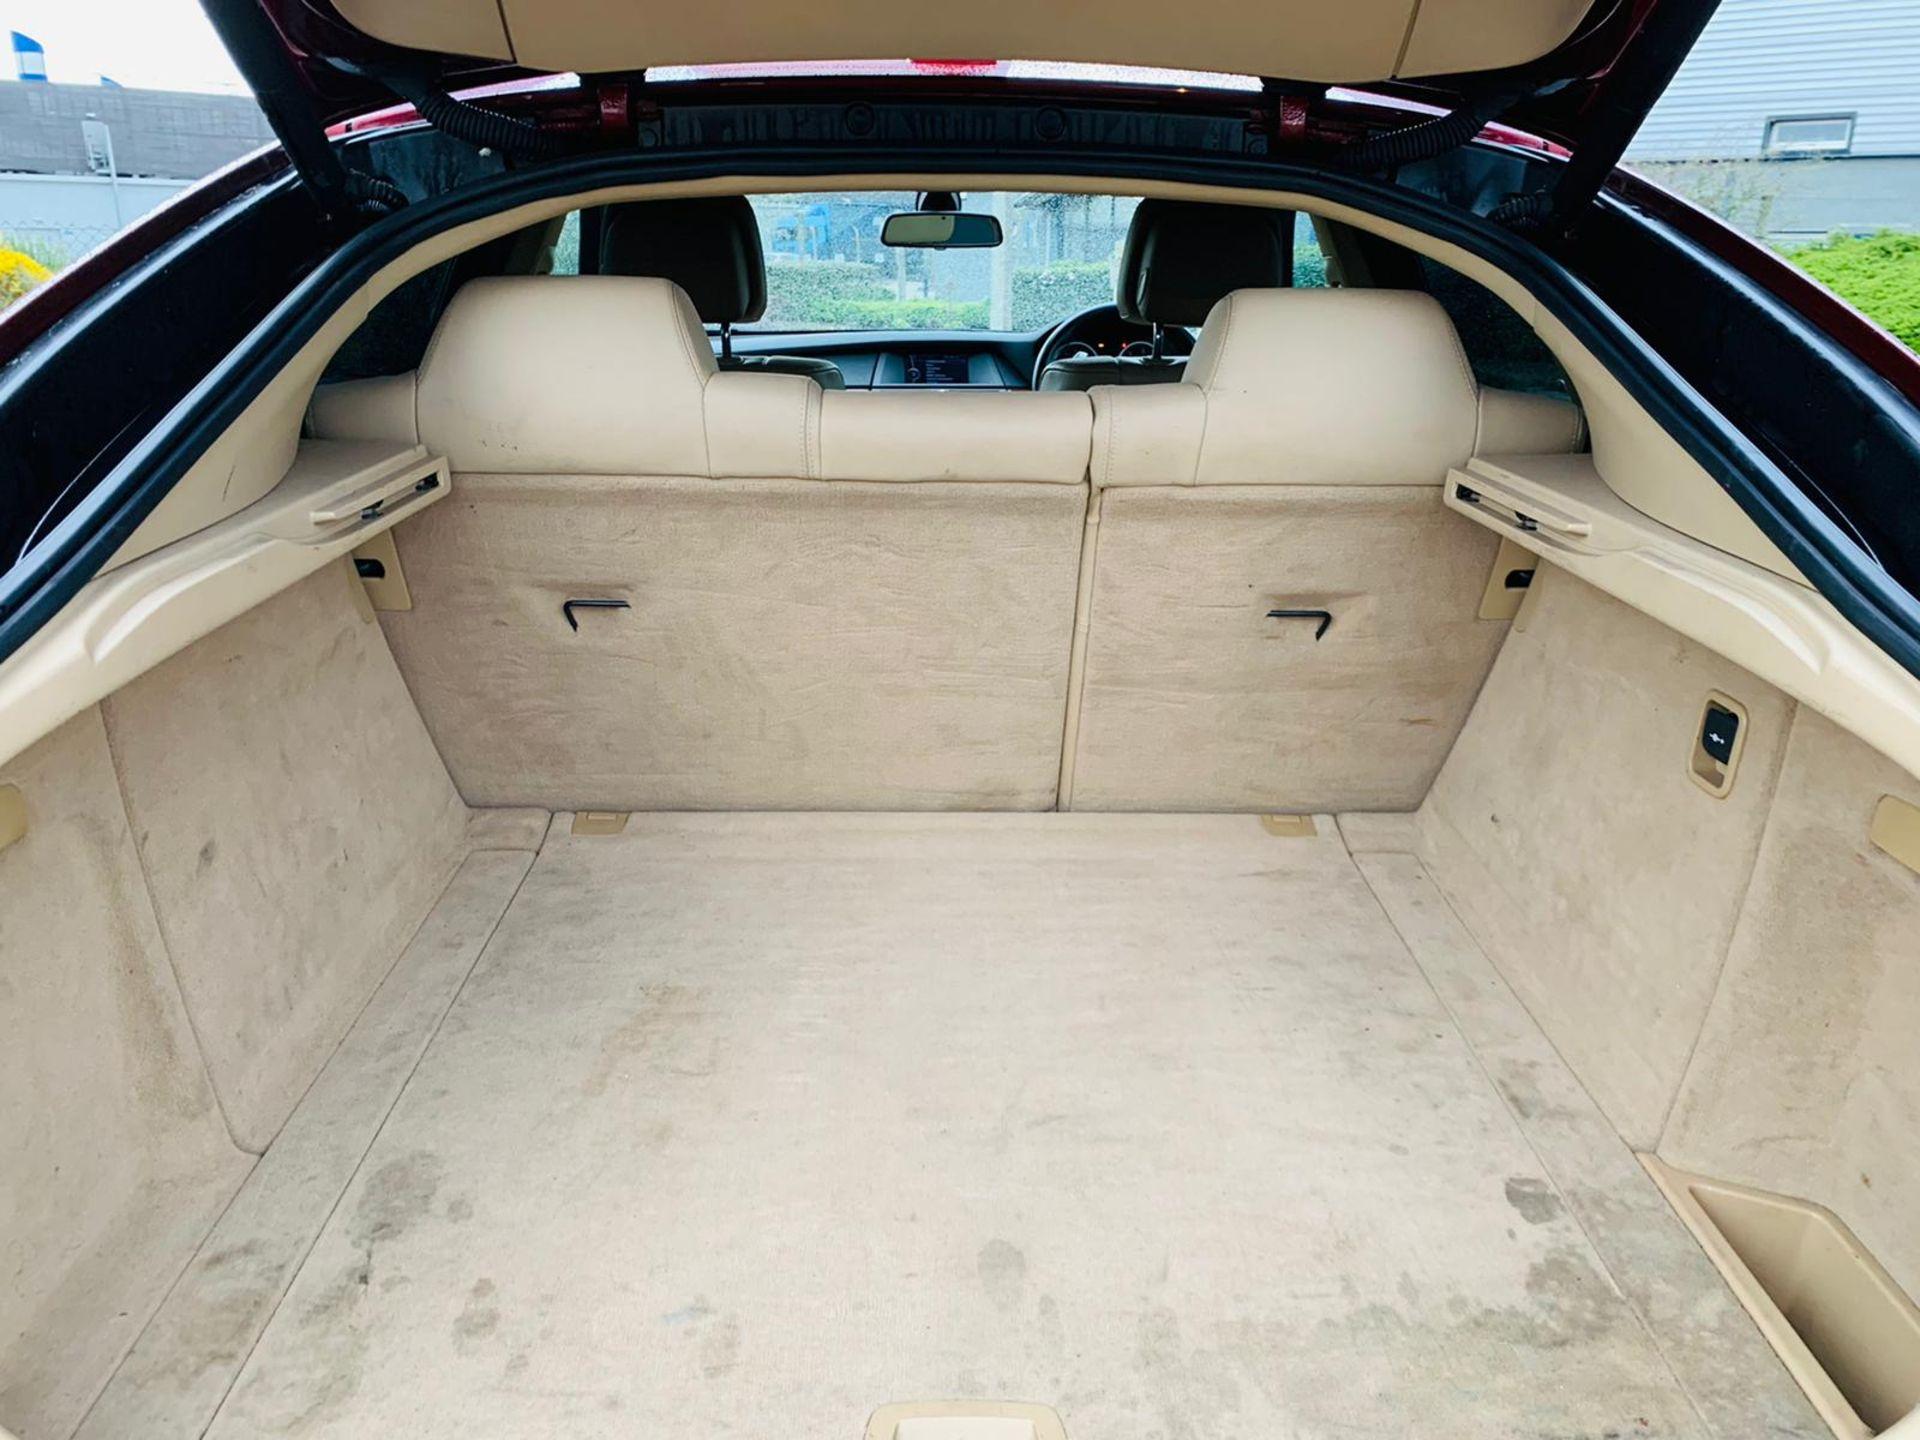 Reseve Met - BMW X6 xDrive 3.0d Auto - 2014 Reg - Leather Interior -Parking Sensors - Reversing Cam - Image 11 of 30